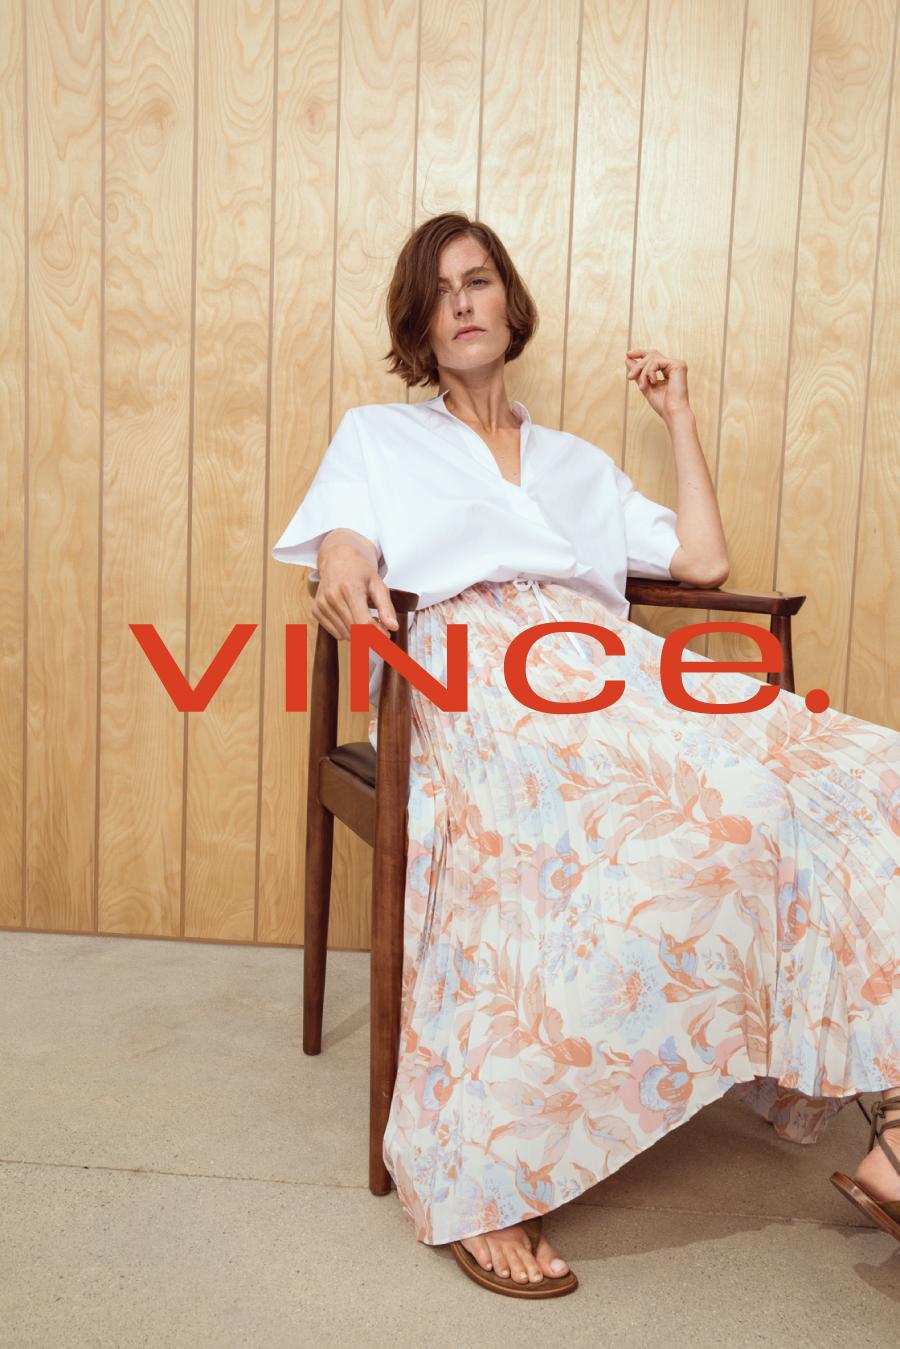 Vince-Image.png